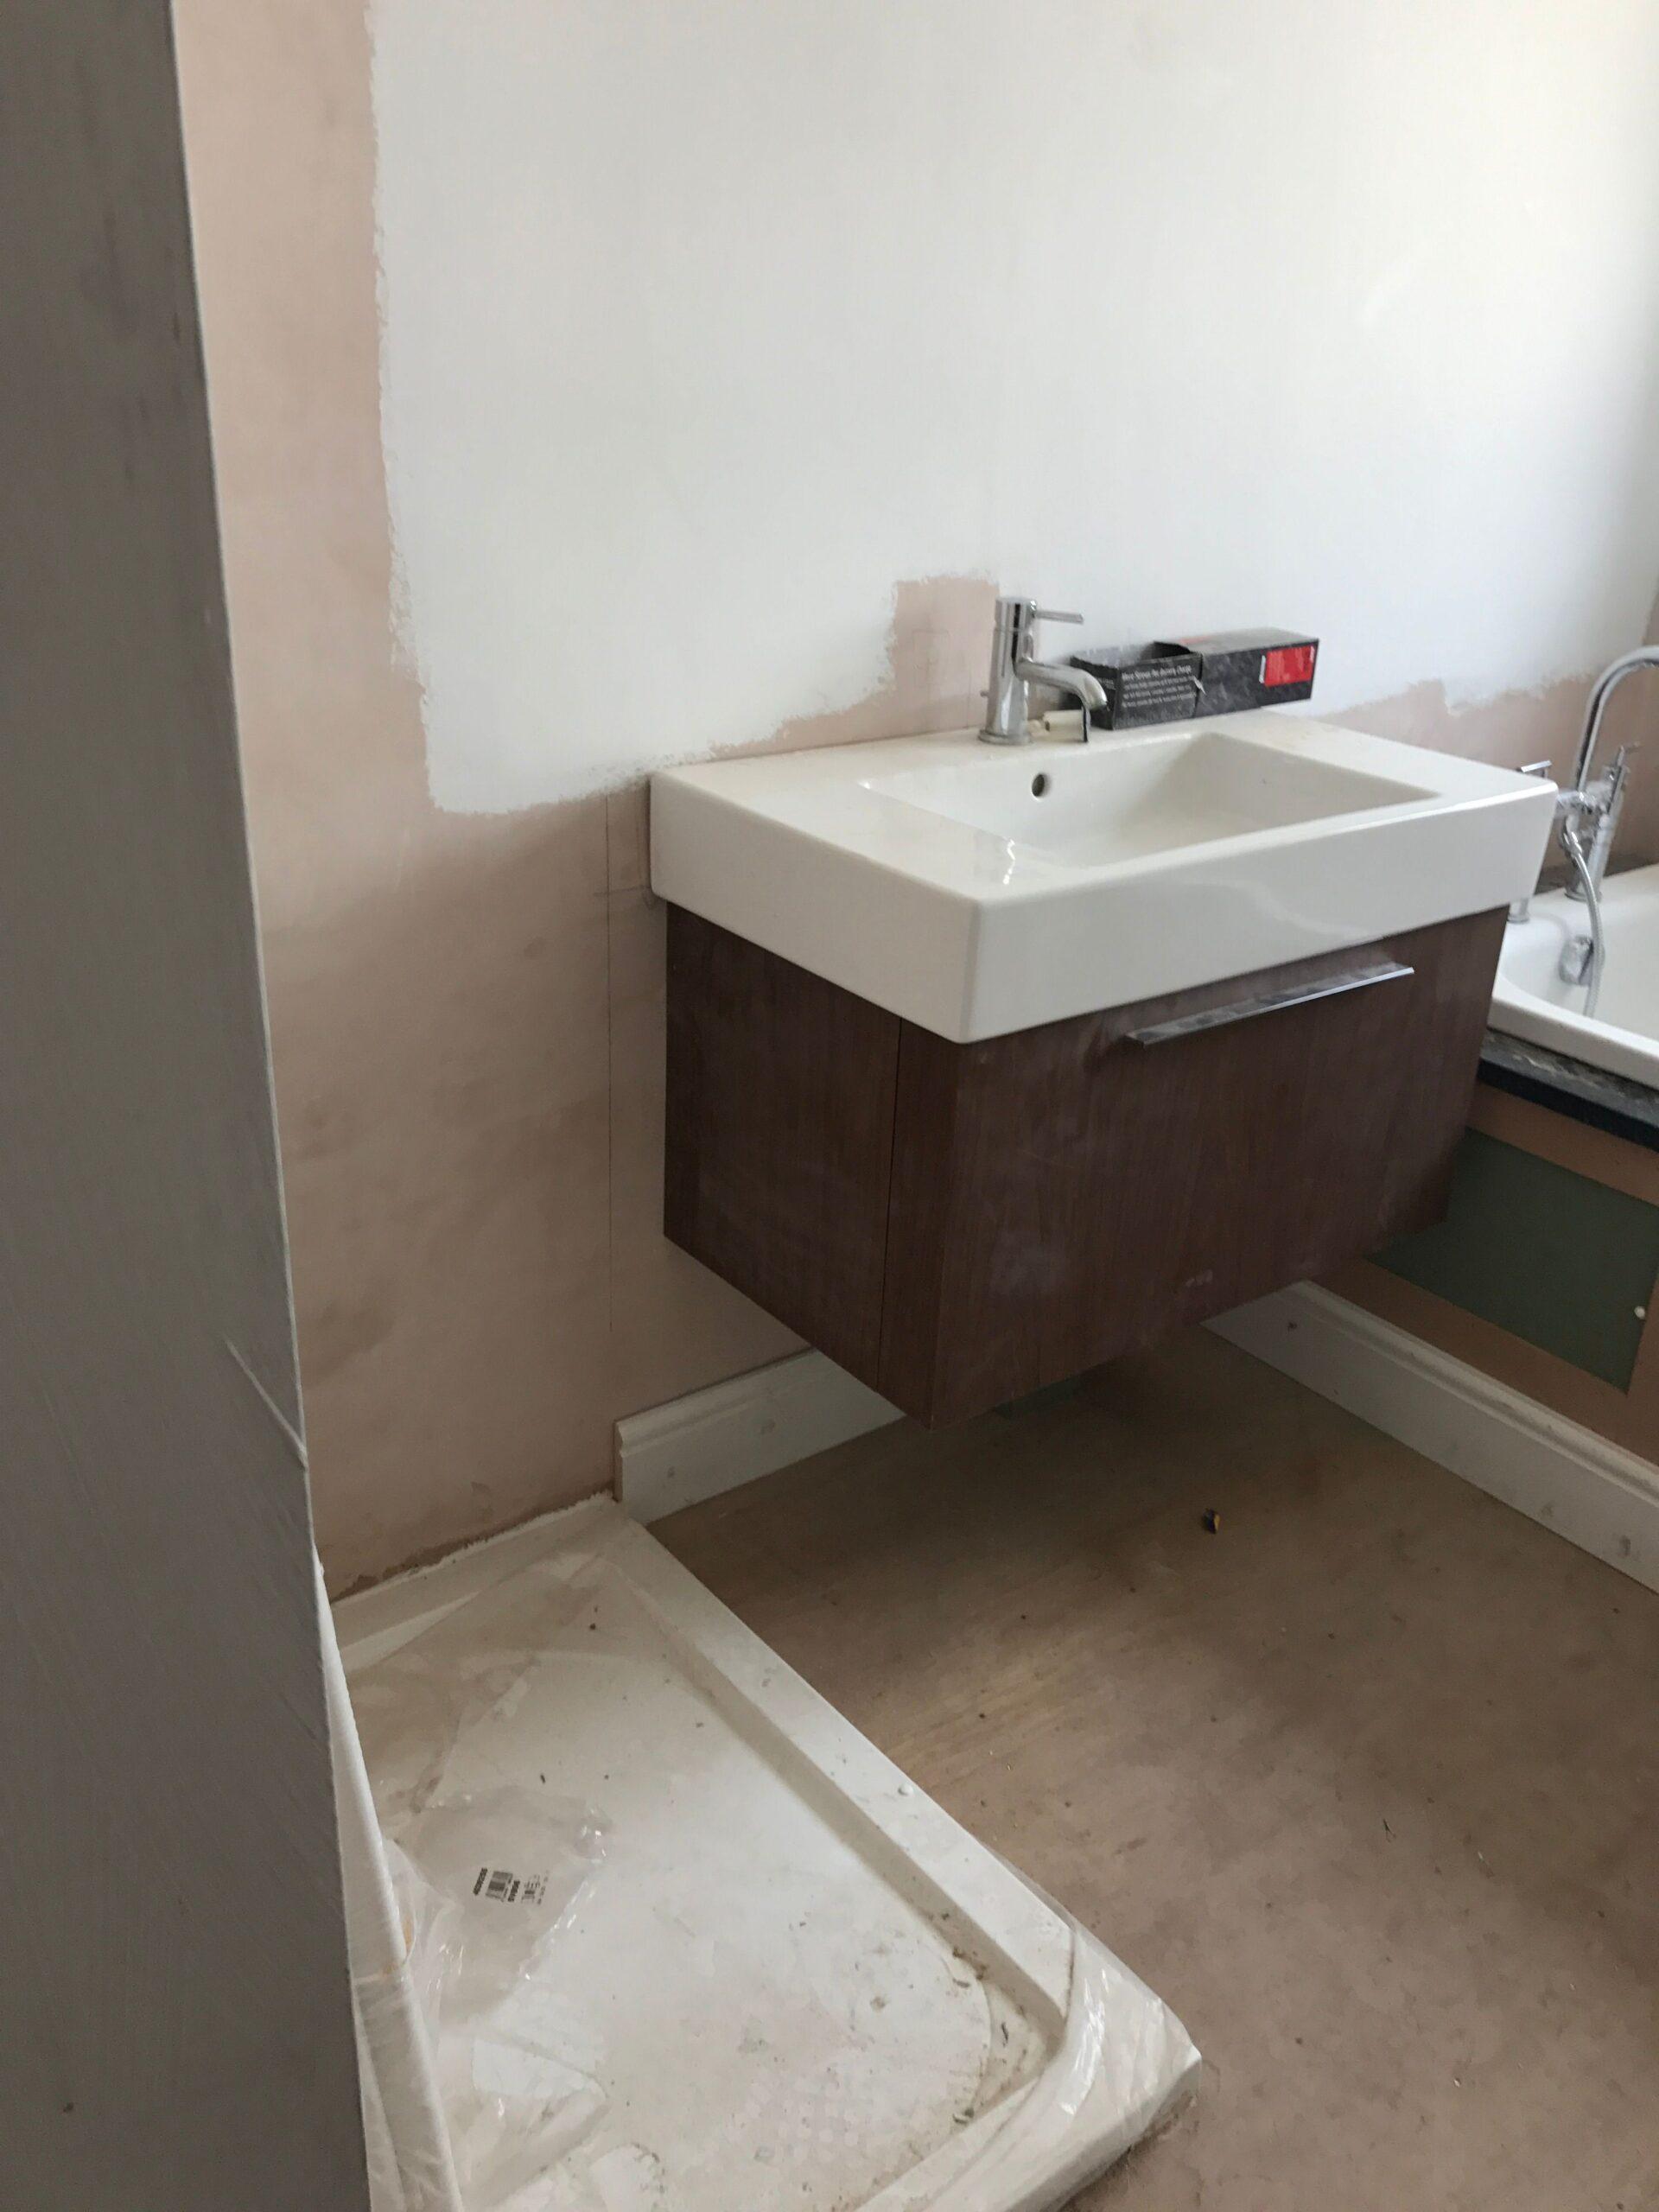 Dunkerry Road First Floor Bathroom Sink Before